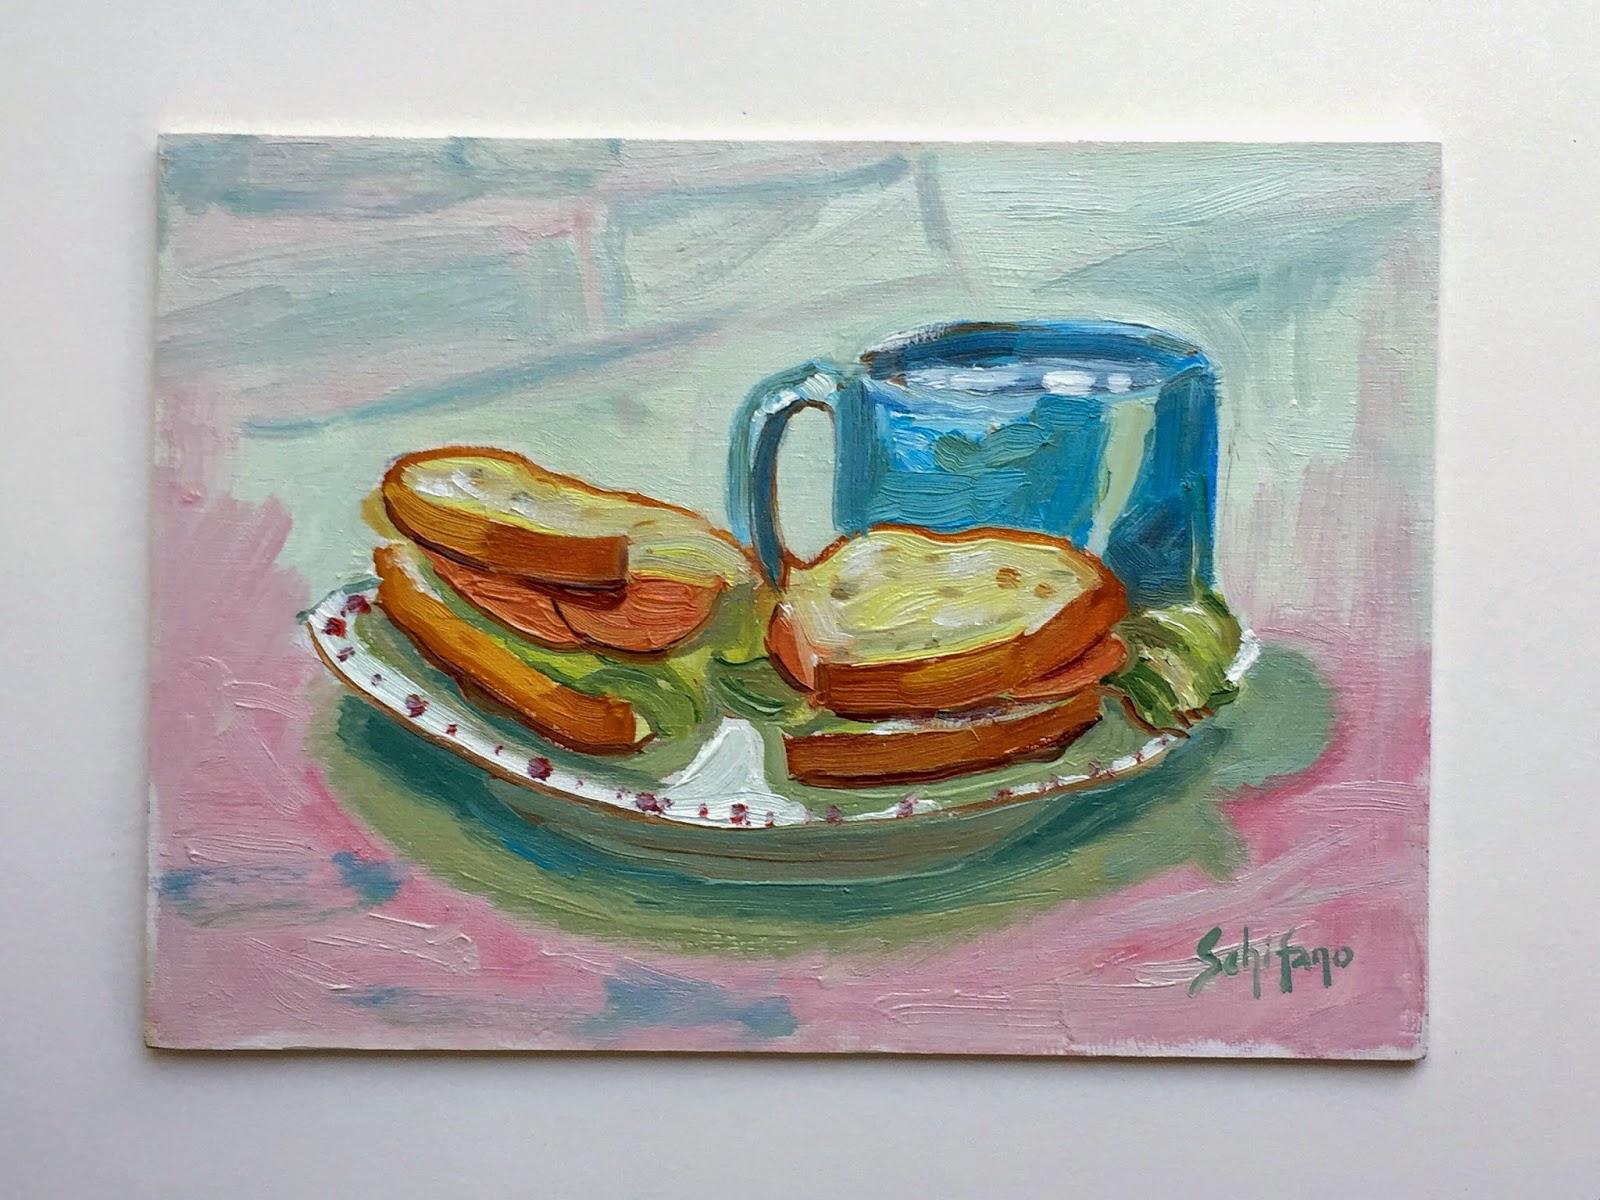 Kath Schifano, Niagara artist, sandwich picture